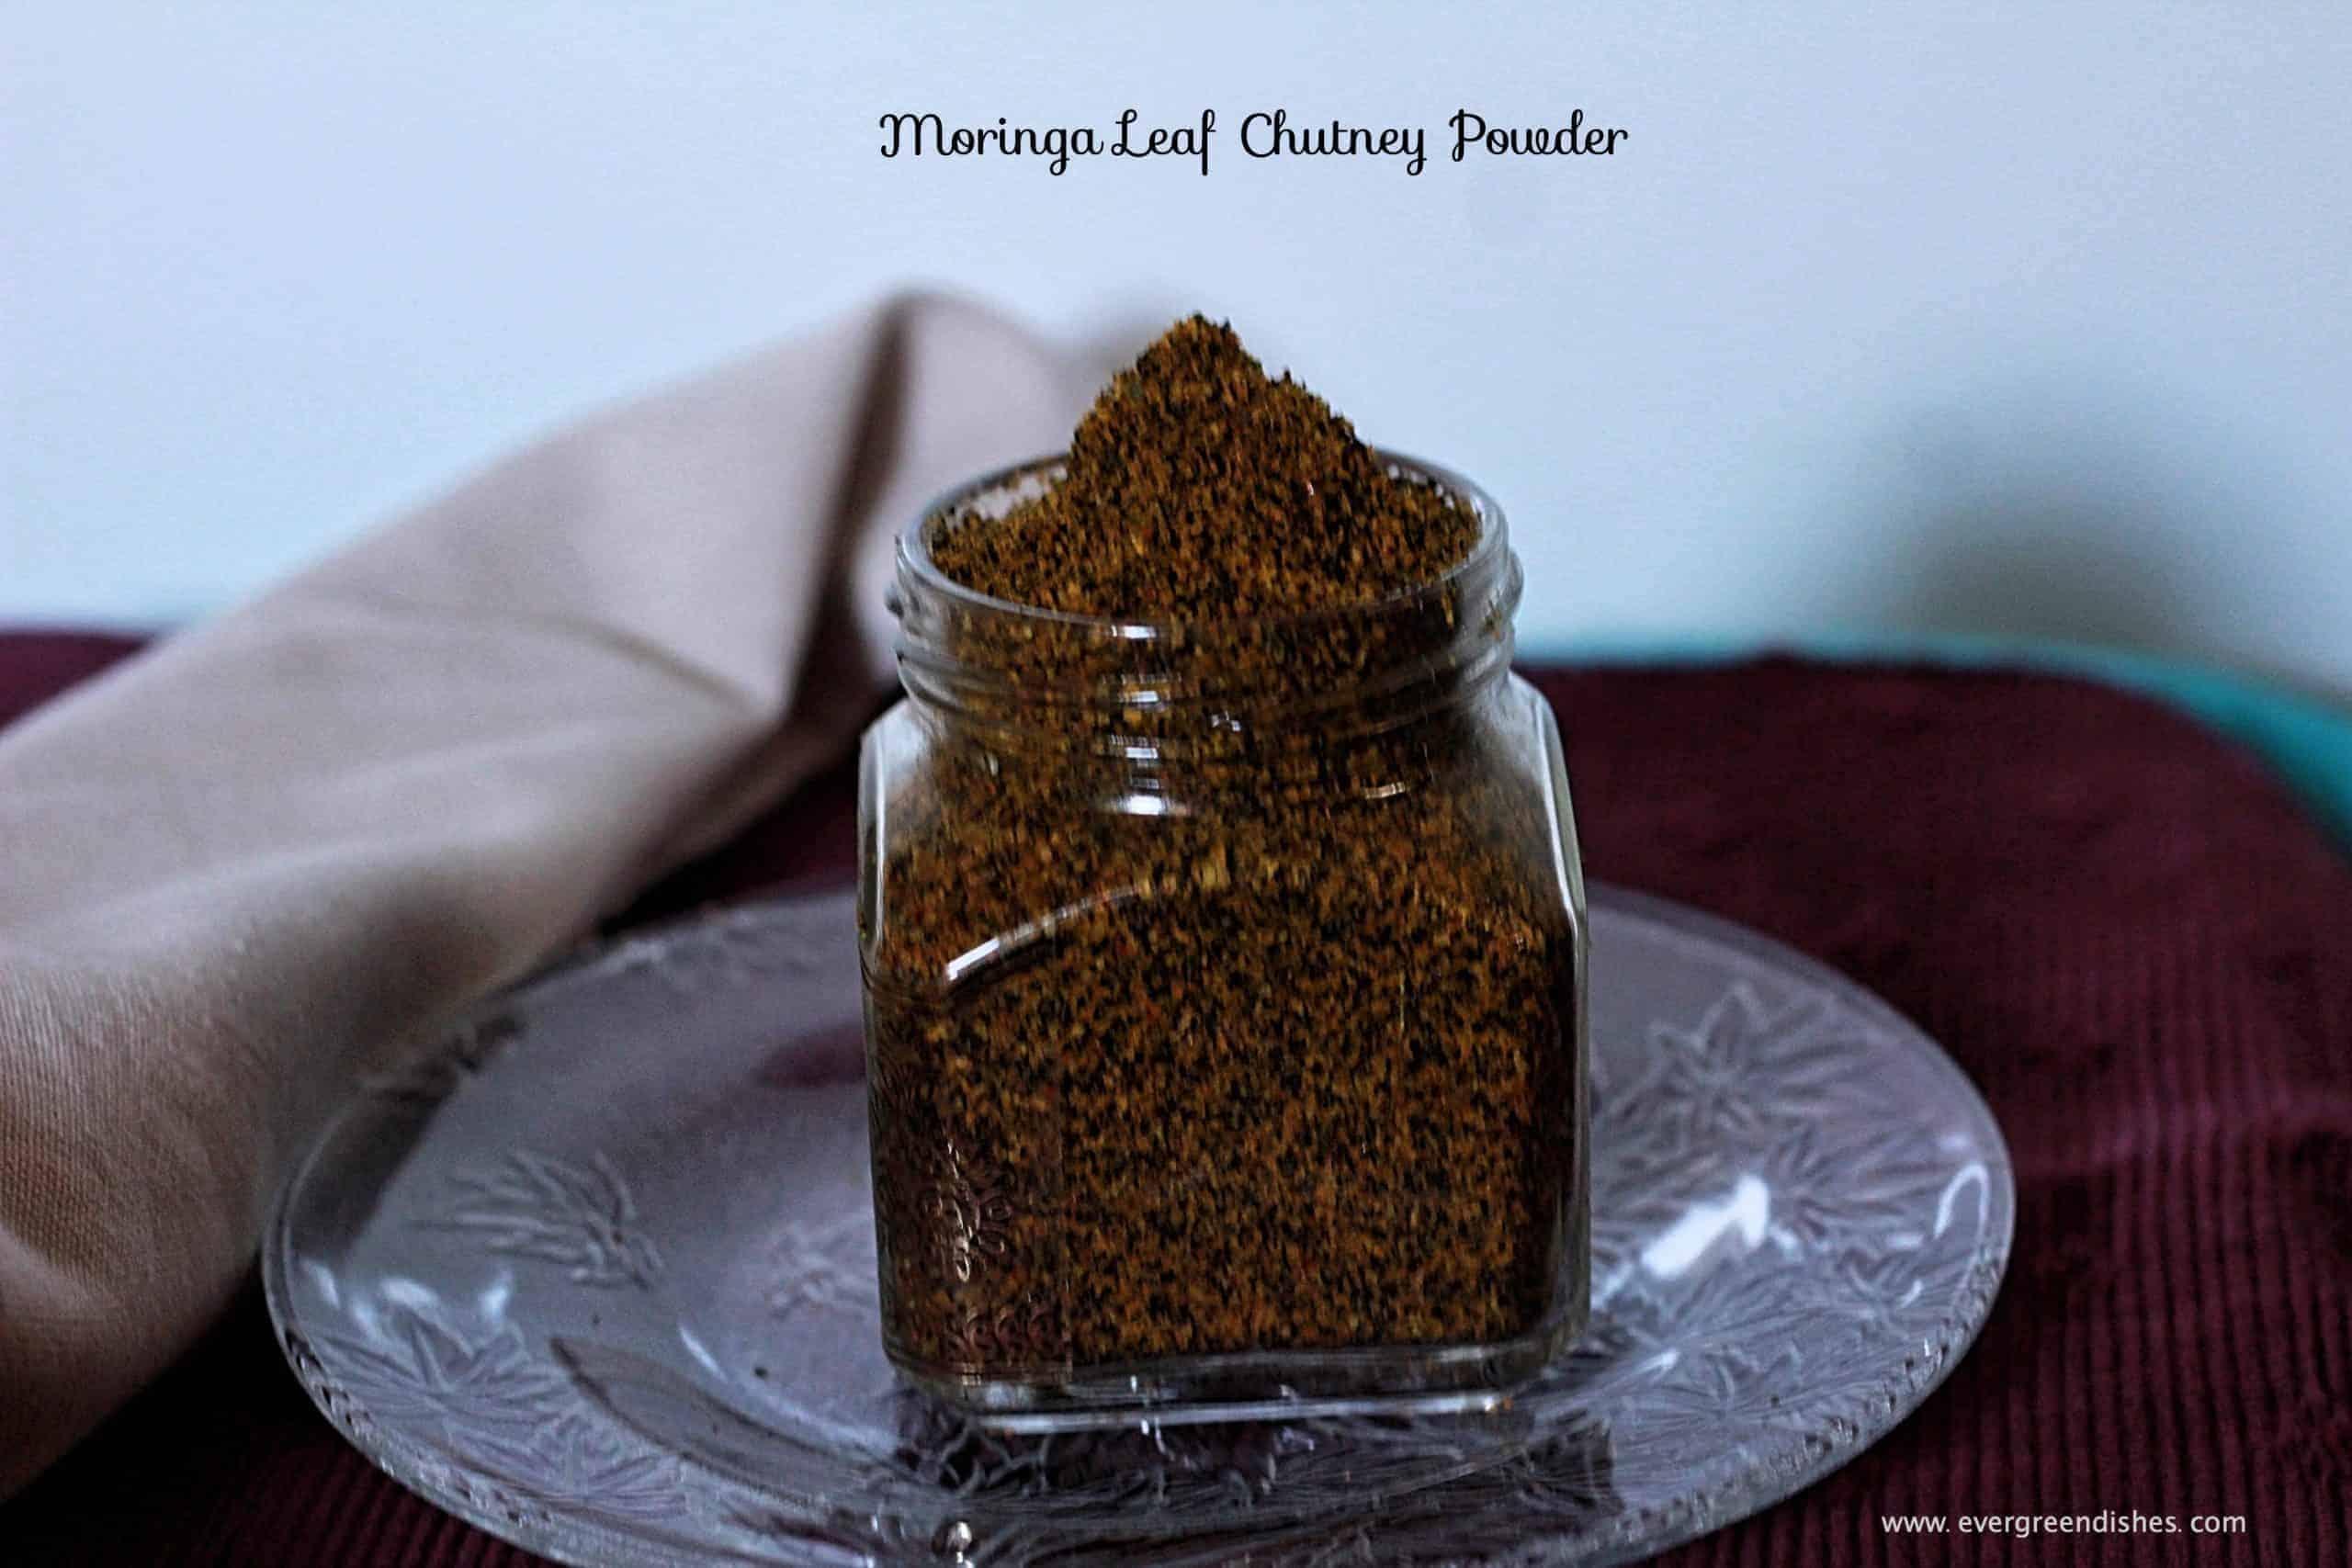 moringa leaf chutney powder